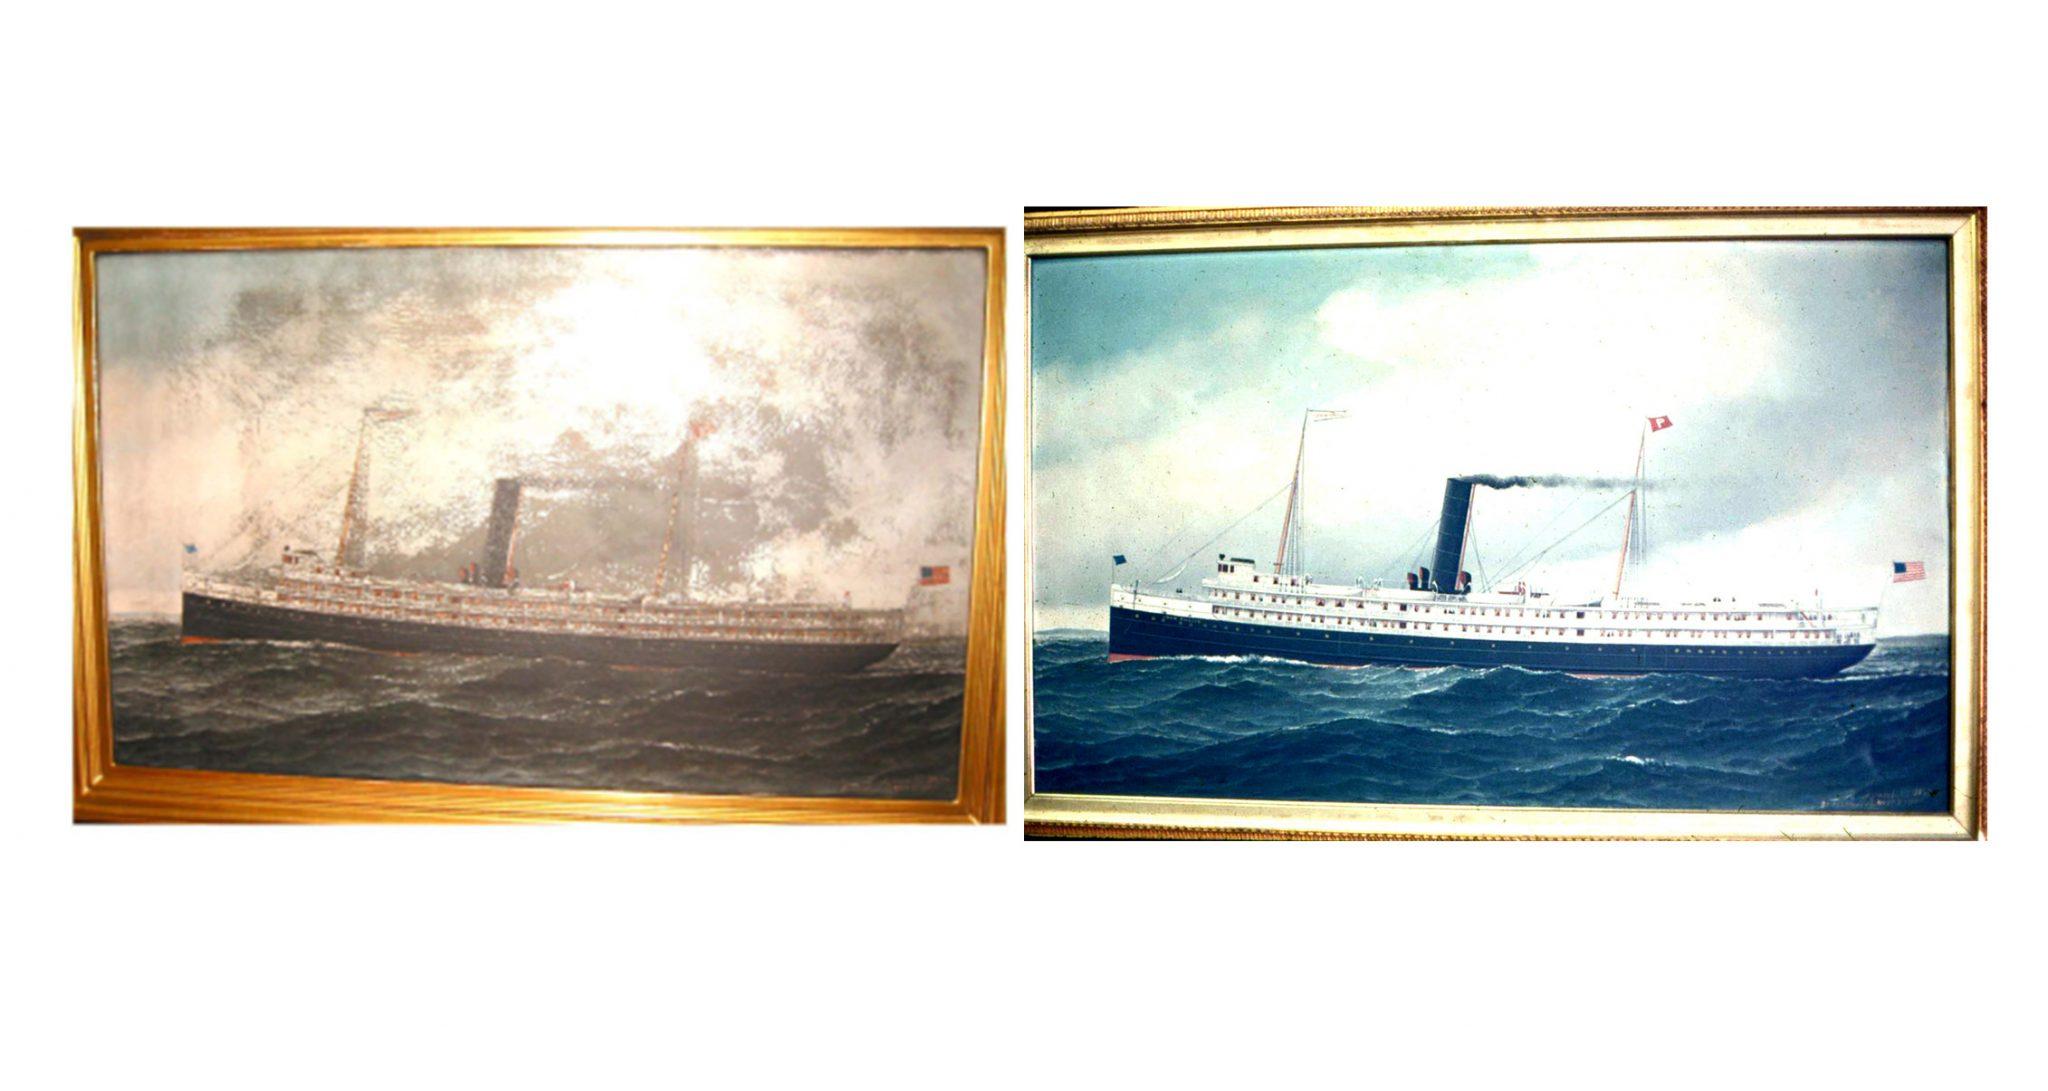 Restoration of Paintings.